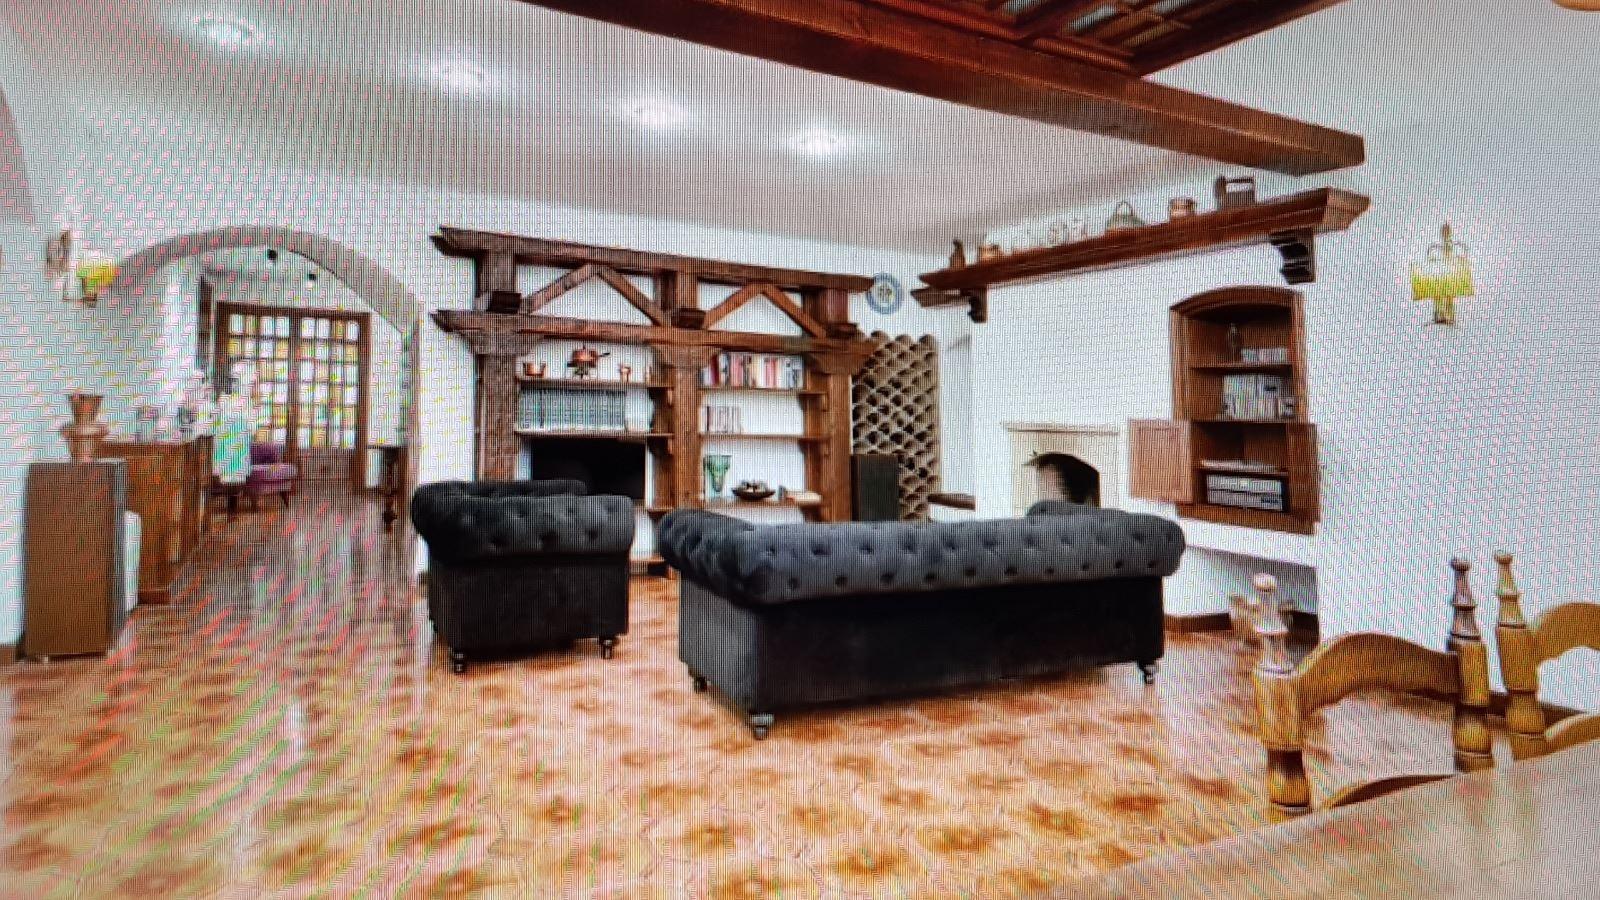 Alquiler Casa  L'arboç. Preciosa casa con encanto, totalmente restaurada, con licencia t